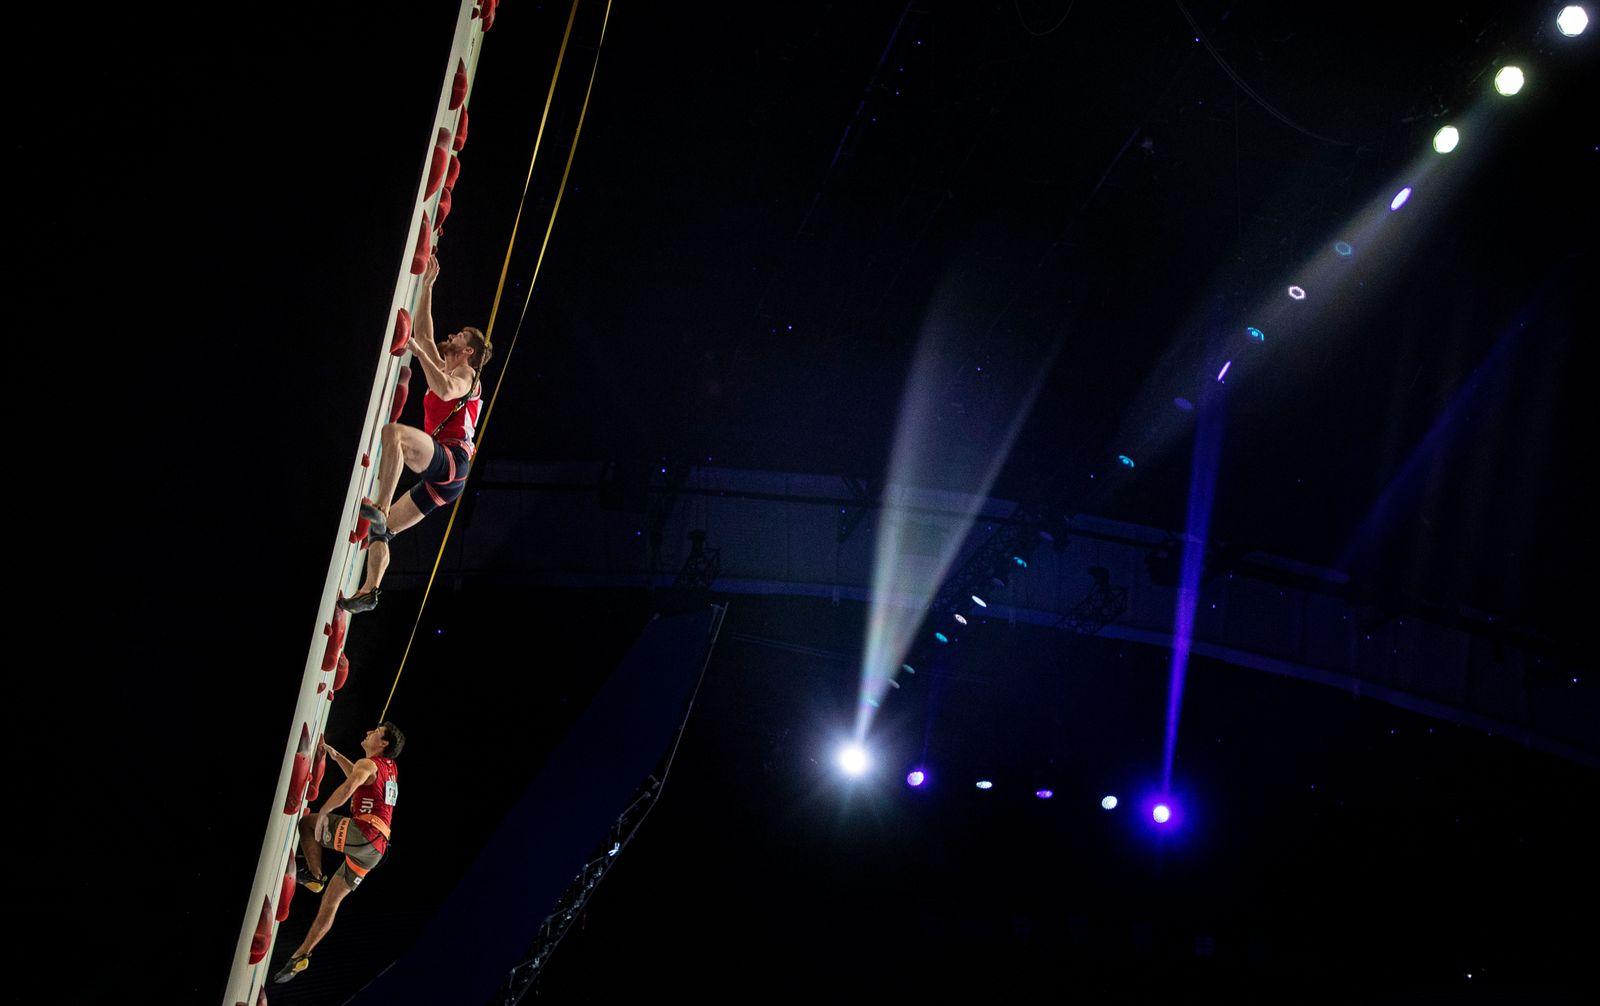 IFSC Climbing European Continental Championships, Moscow, Russian Federation - 21 Nov 2020